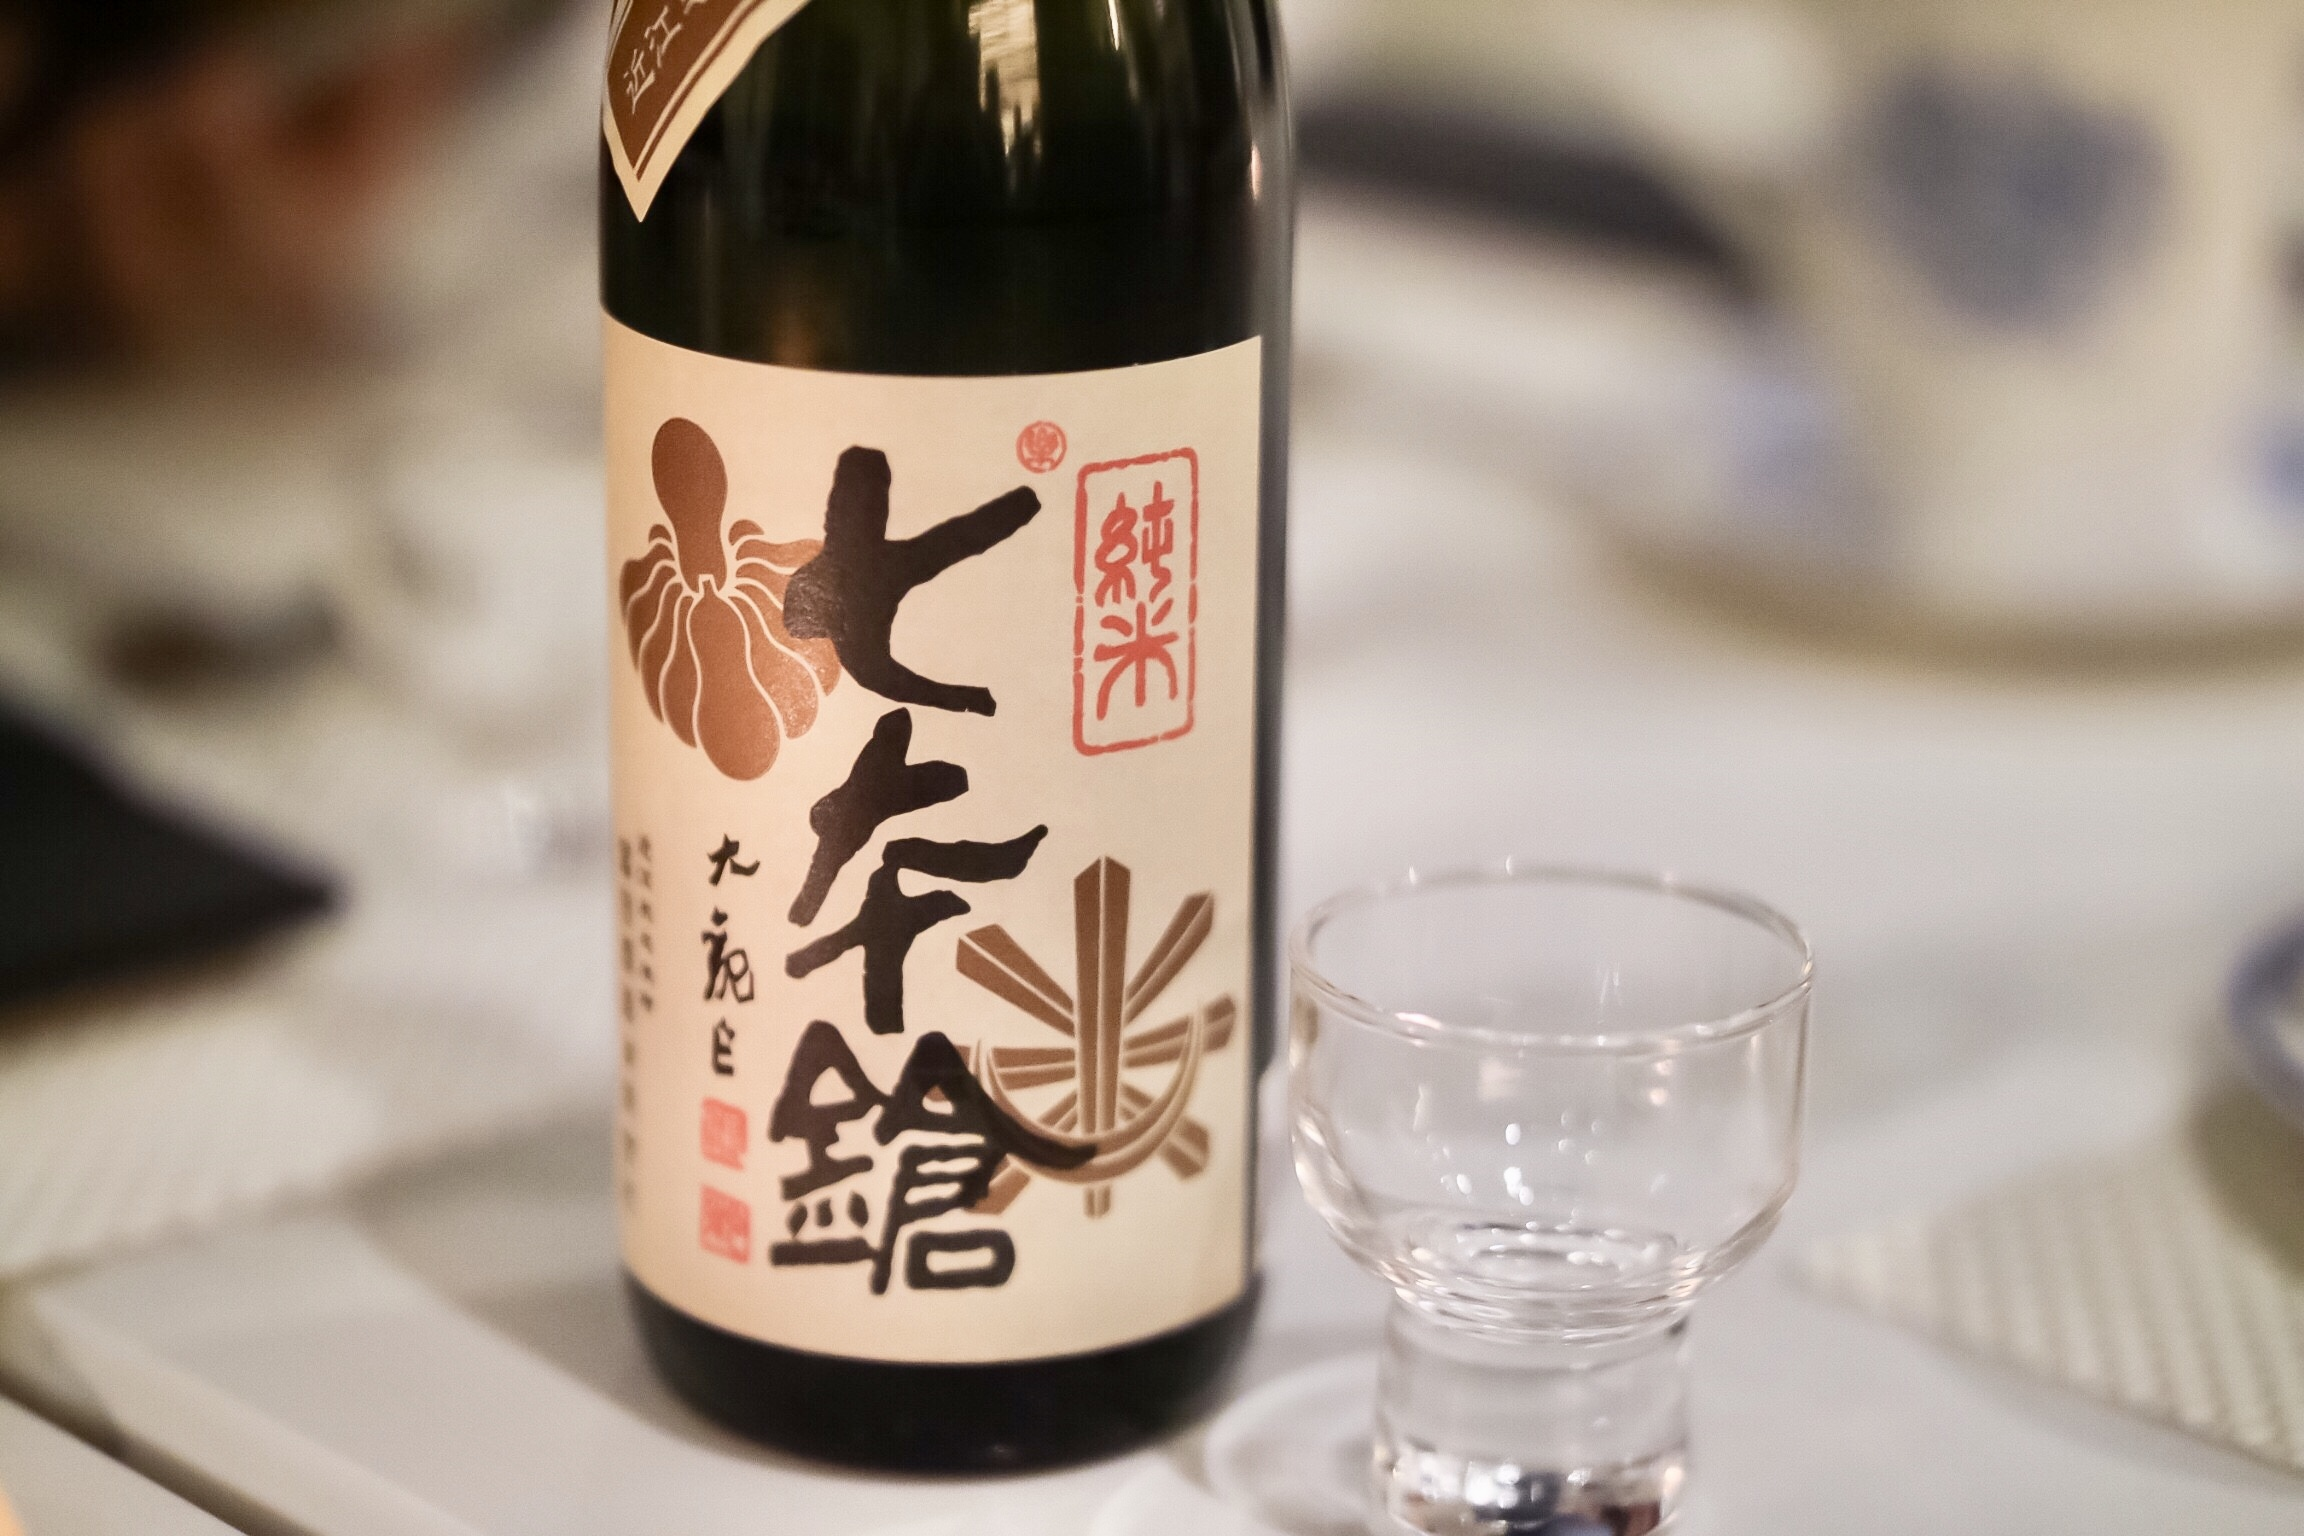 Shichi hon yari 'Tama Sakae'junmai